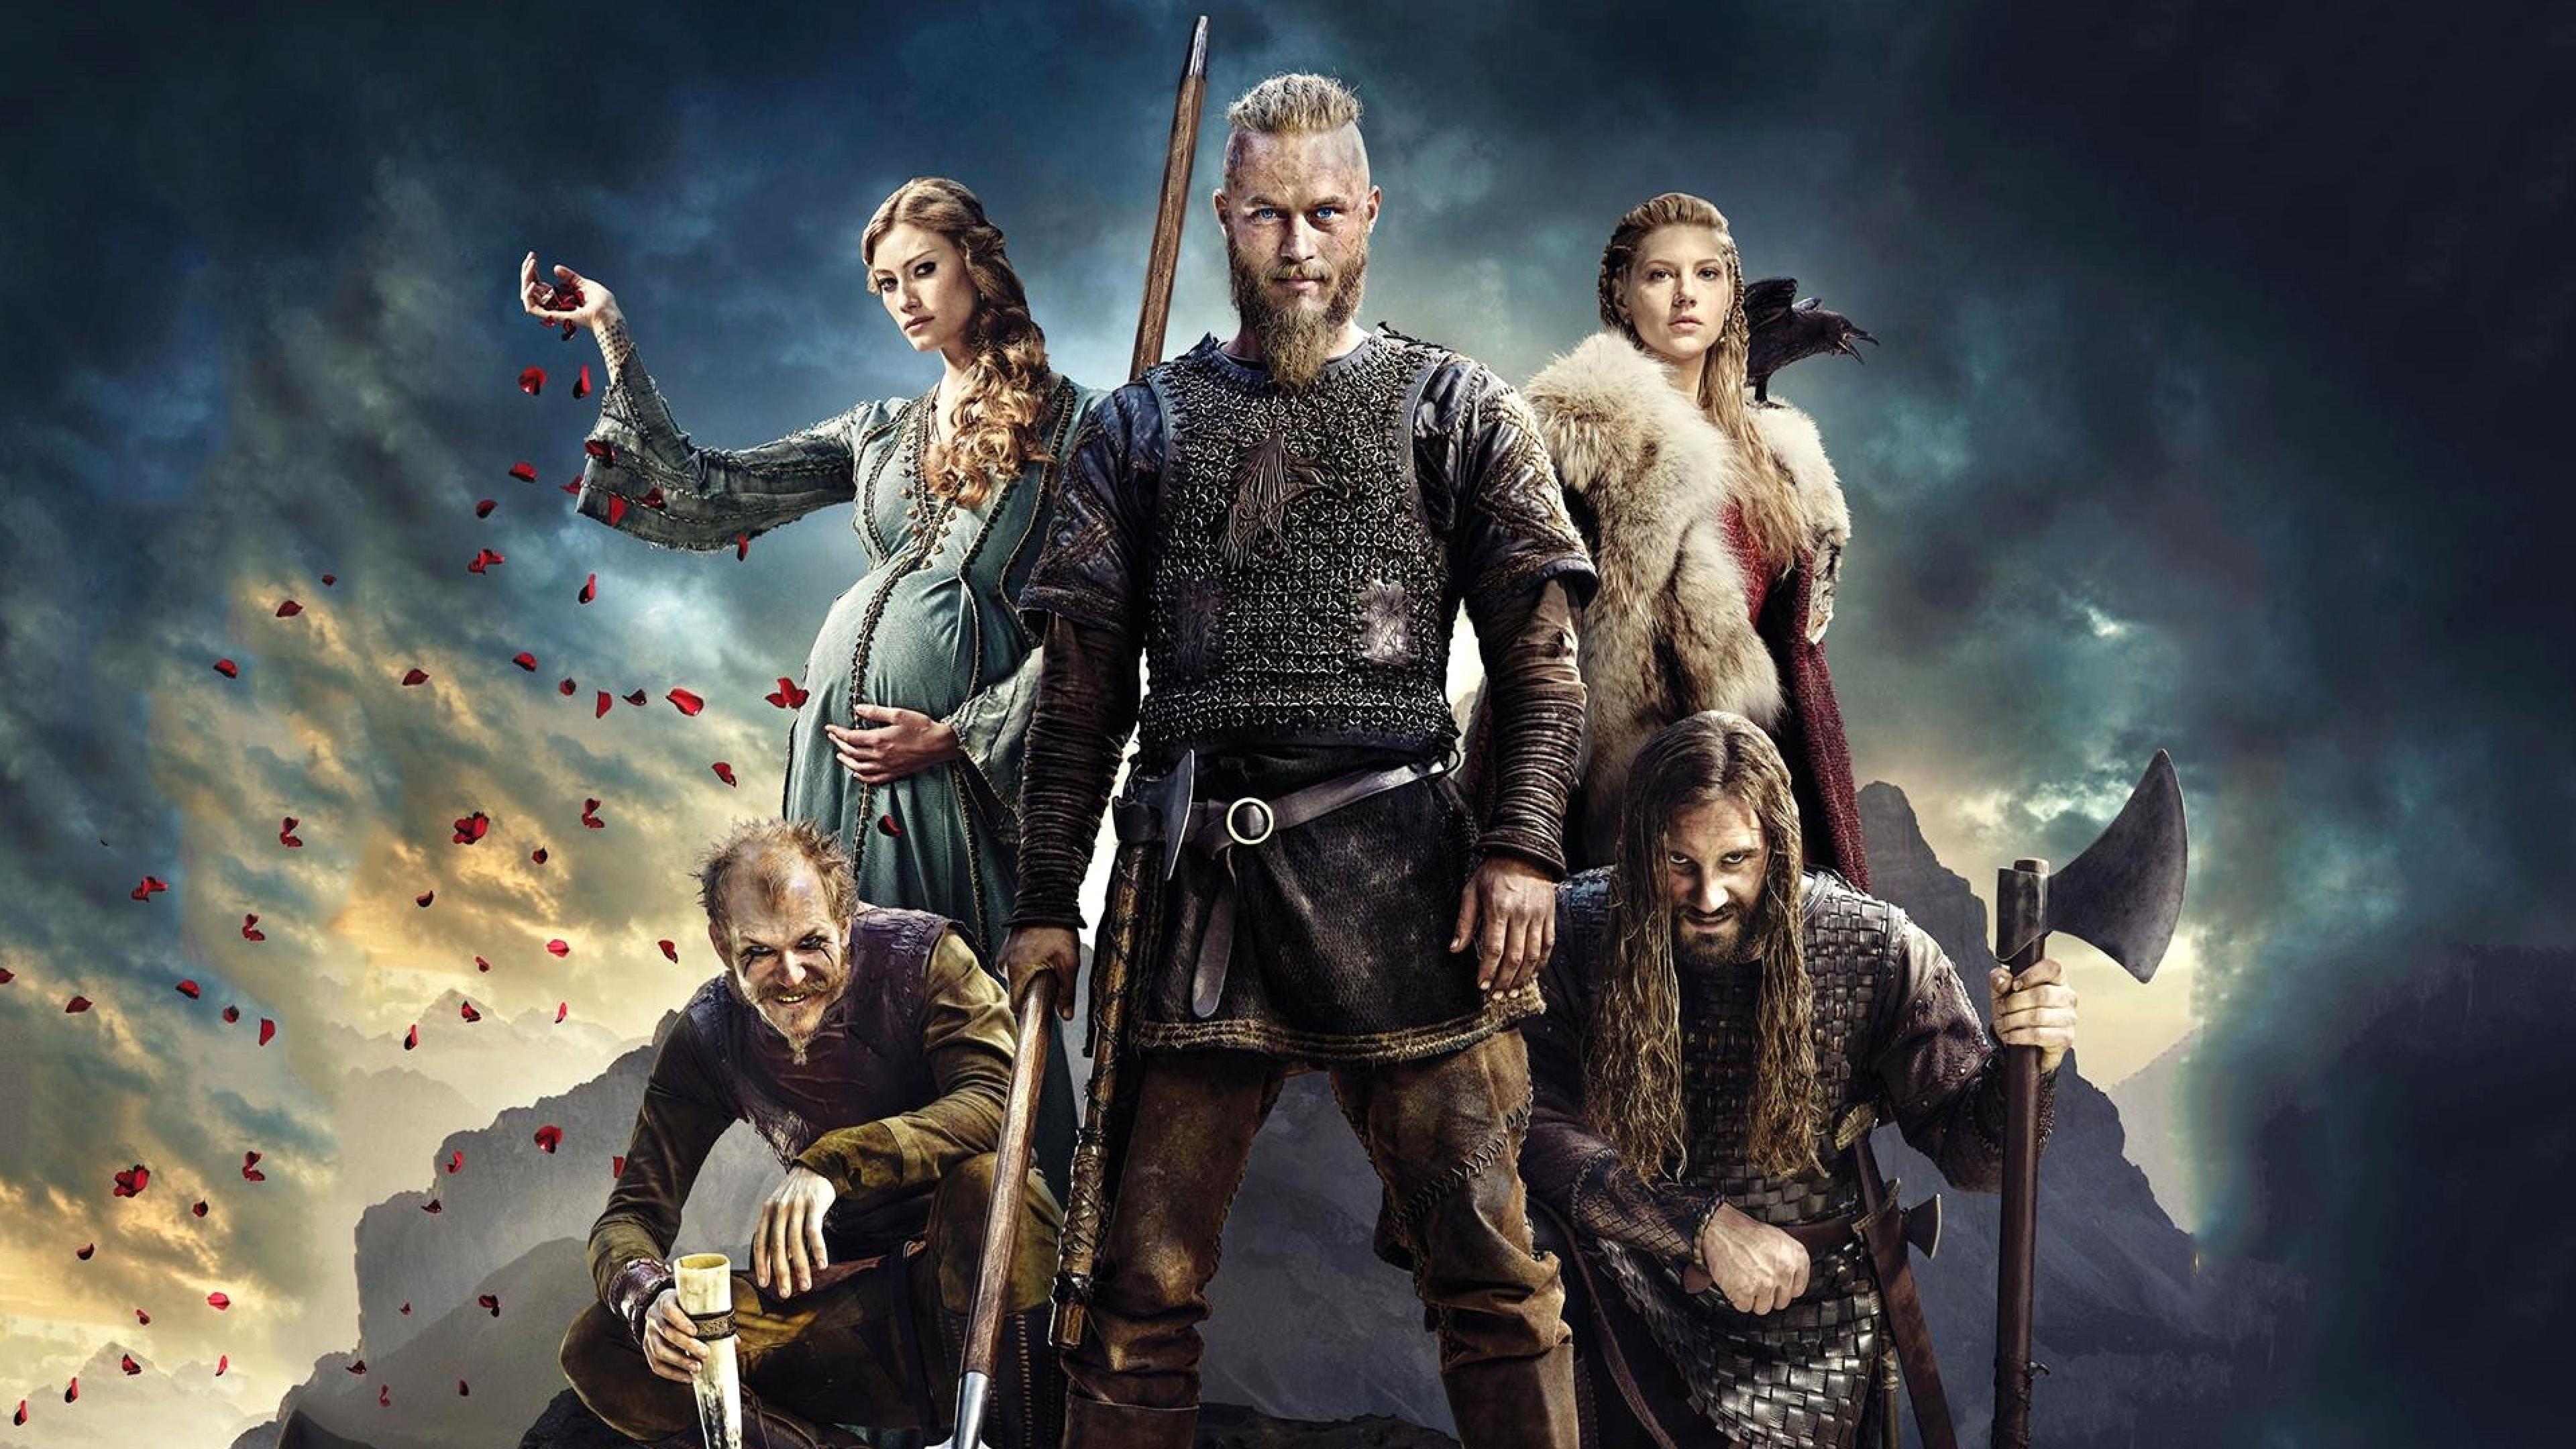 Pin by Pamela Hanna on Movies and Tv Shows | Vikings season